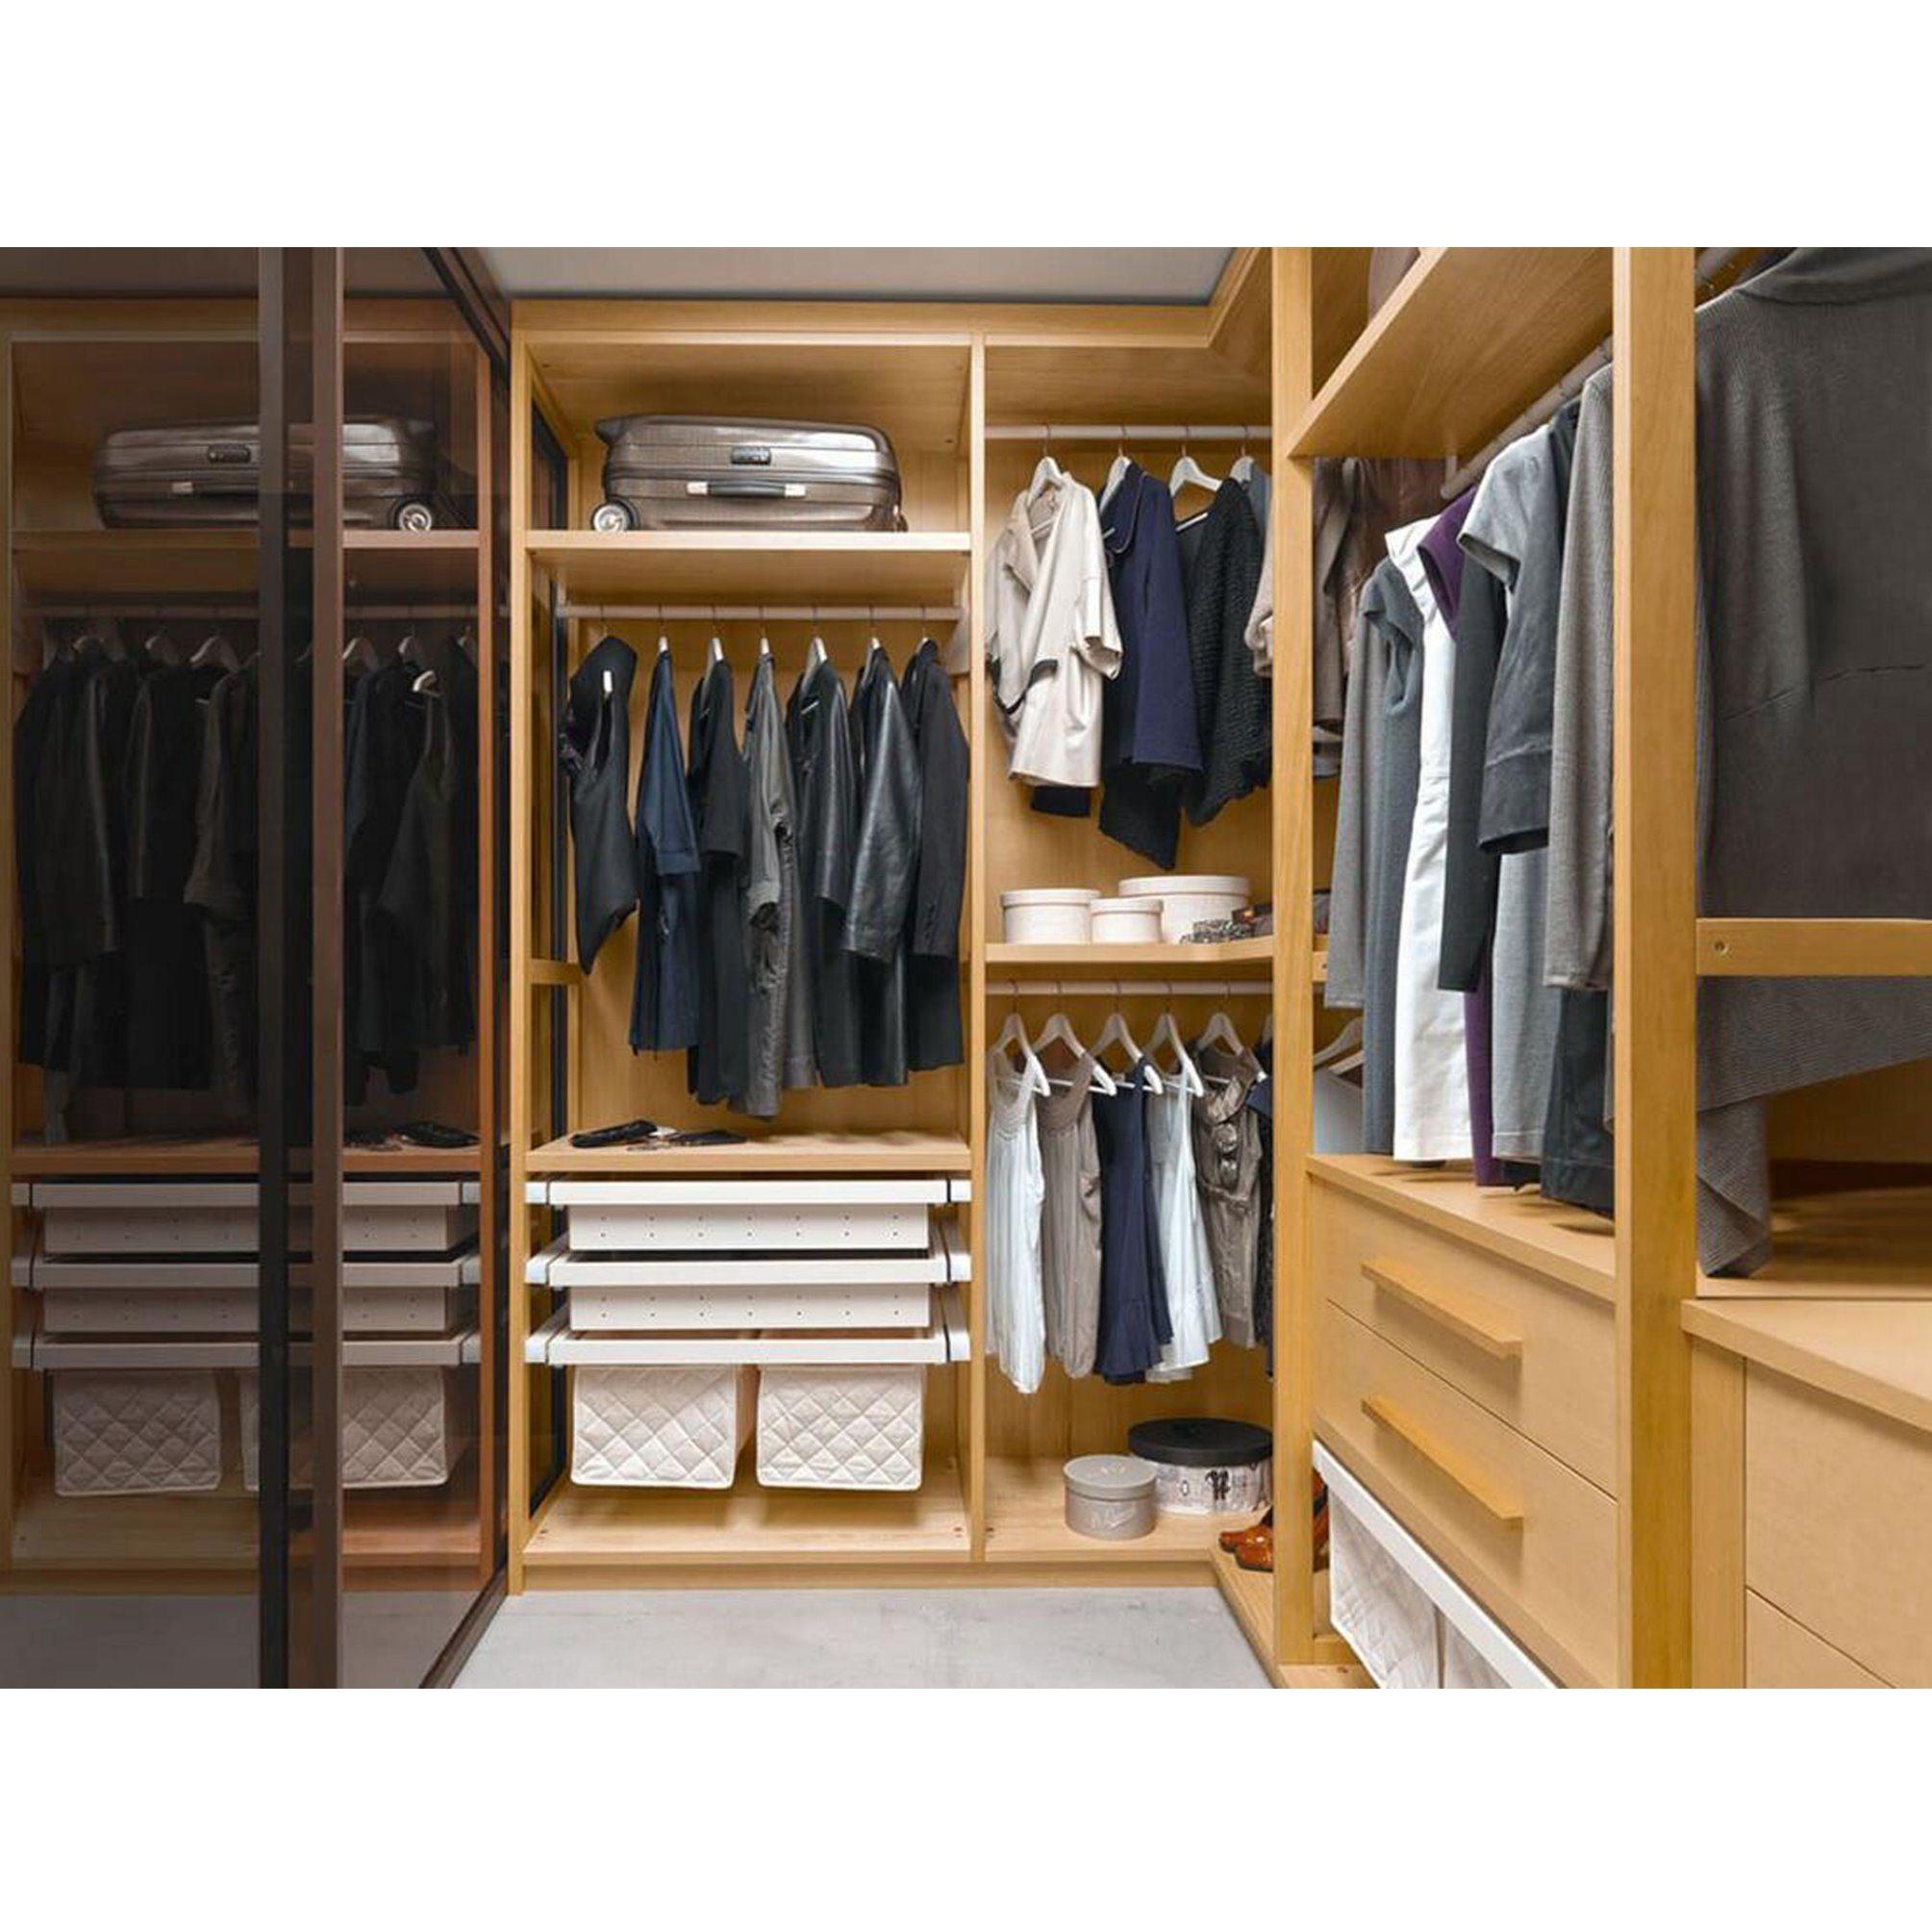 Modern Stylish Melamine Walk in Wardrobe for Dressing Room